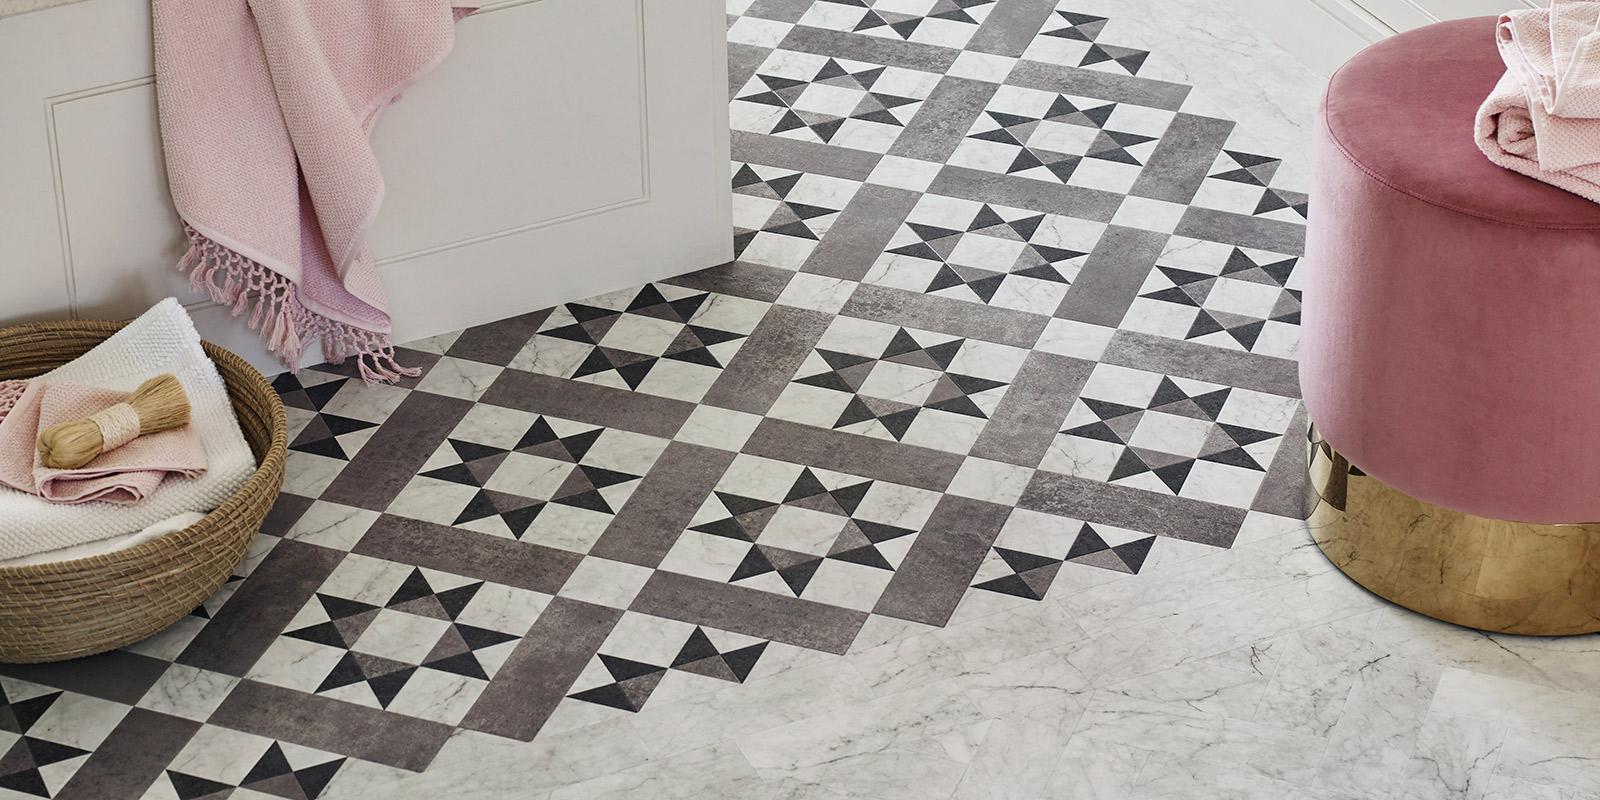 Classic marble in Amtico flooring - Amtico for your home